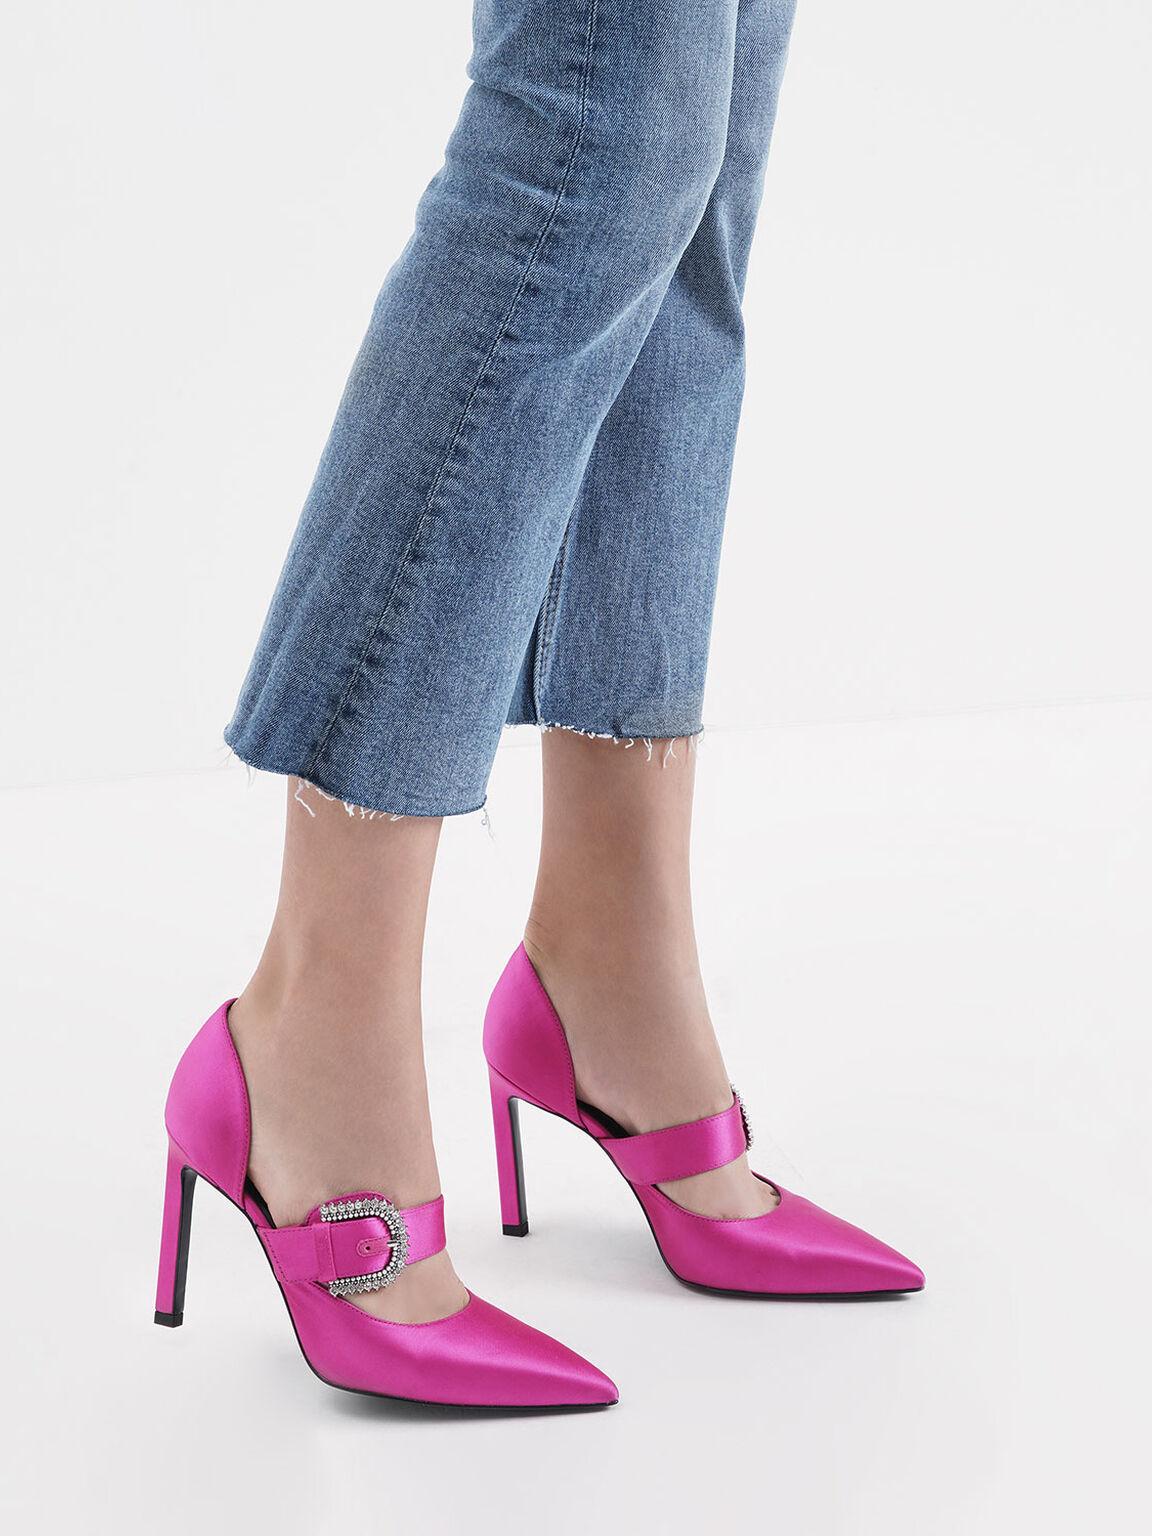 Satin Embellished Buckle Mary Jane Heels, Fuchsia, hi-res